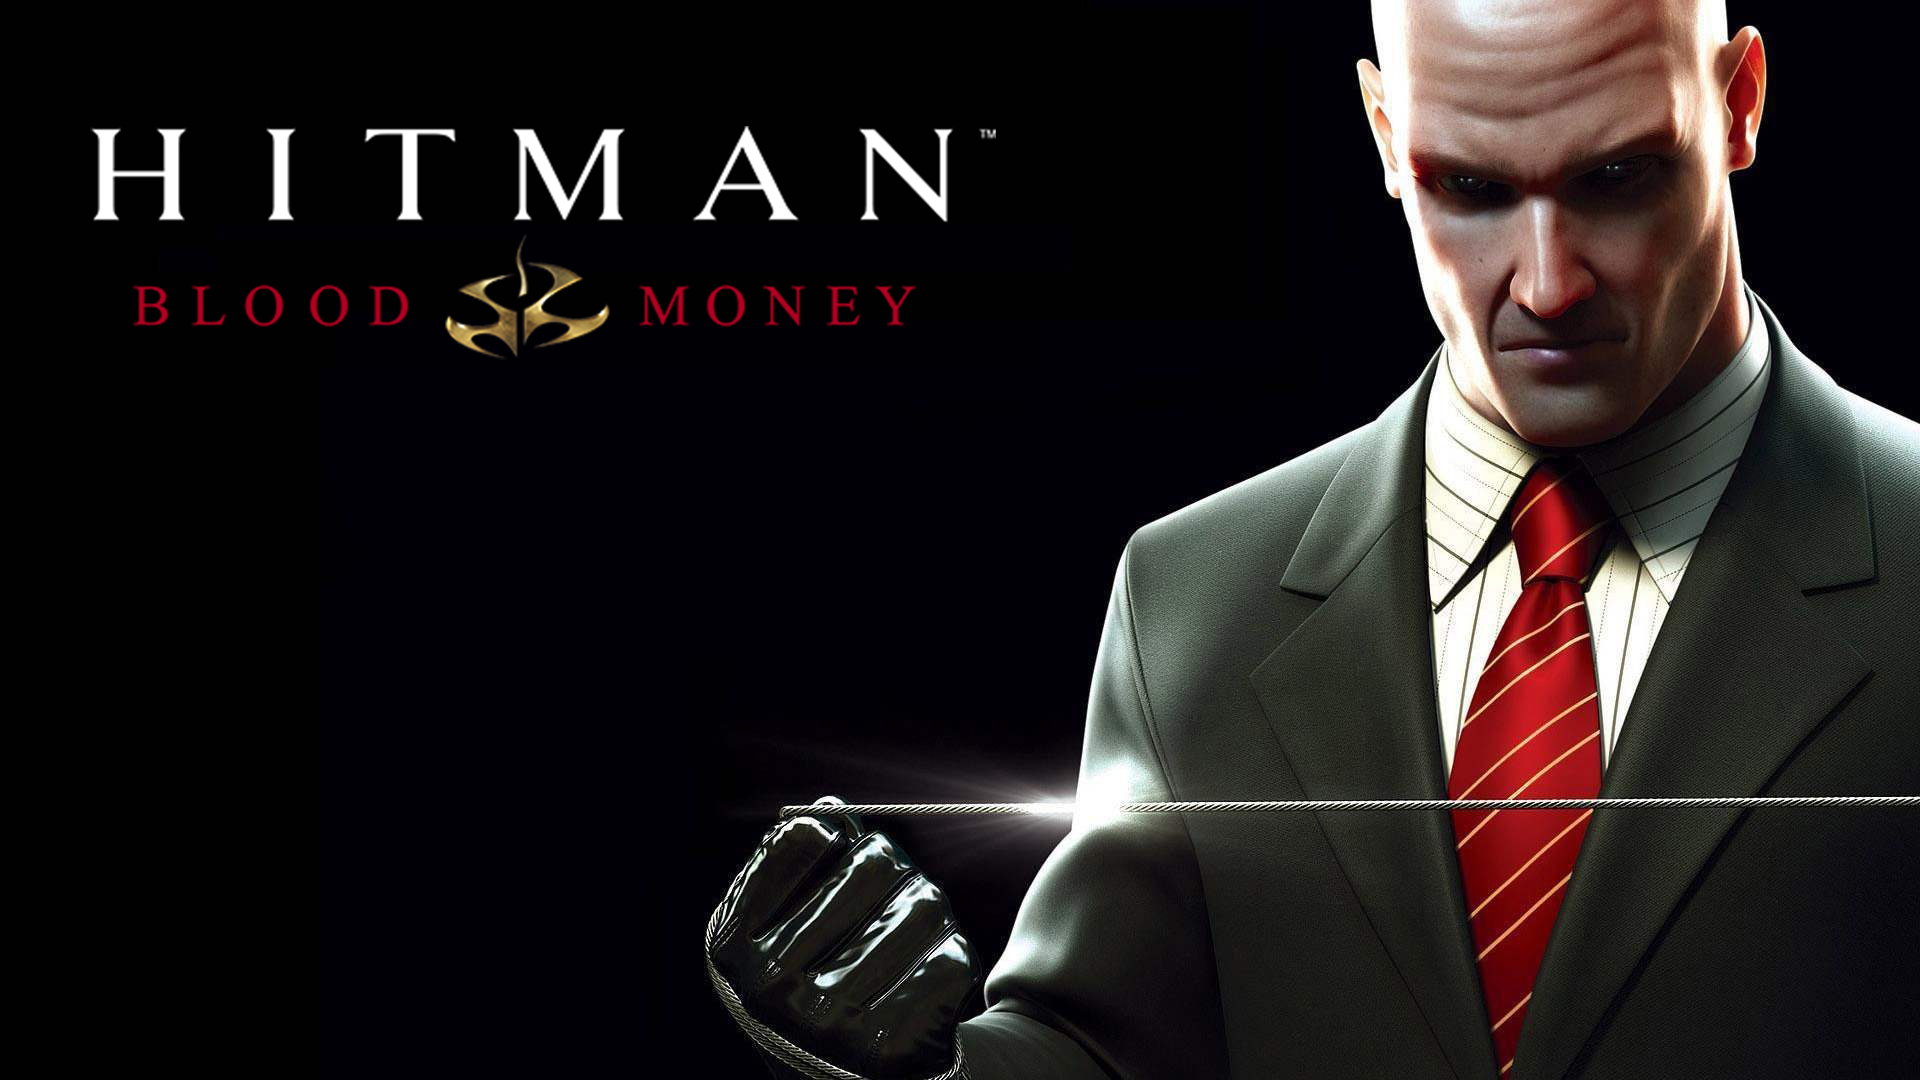 hitman blood money free download for pc